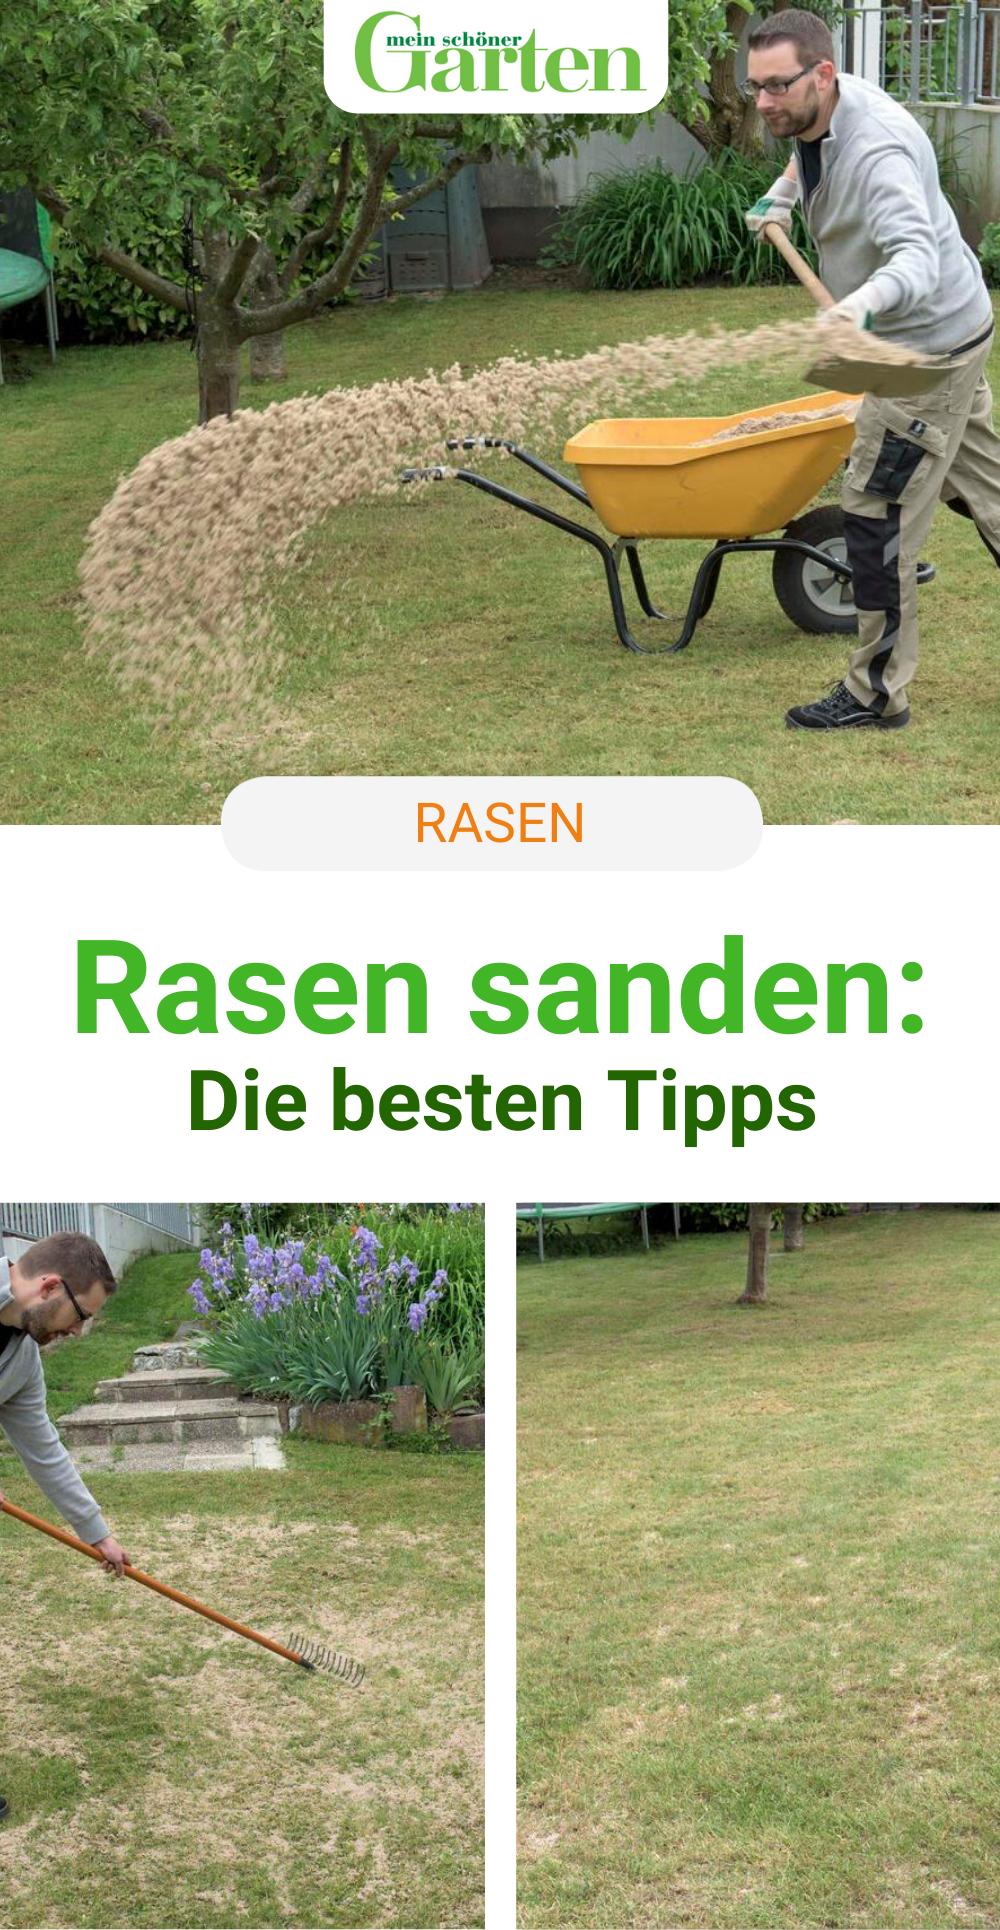 Rasen Sanden Geheimtipp Bei Lehmigen Boden In 2020 Garten Bepflanzen Garten Anpflanzen Garten Hochbeet